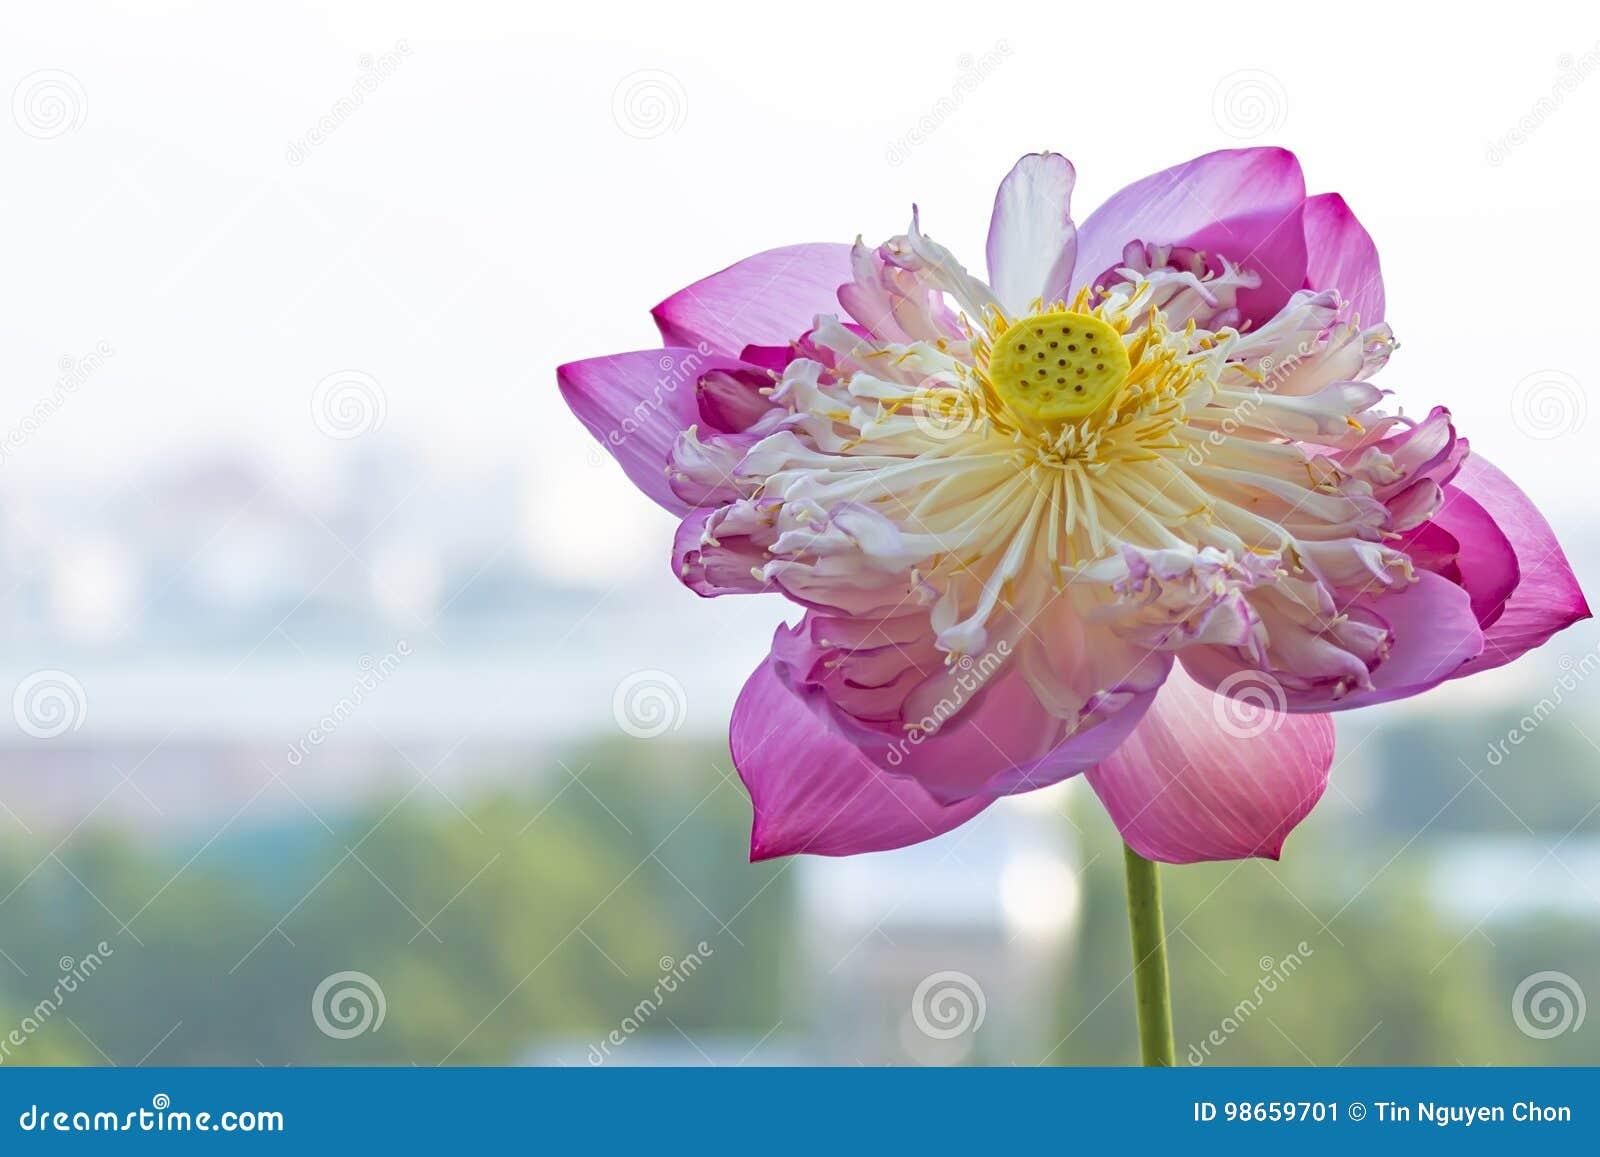 Lotus flower stock image image of sacred names pink 98659701 download lotus flower stock image image of sacred names pink 98659701 mightylinksfo